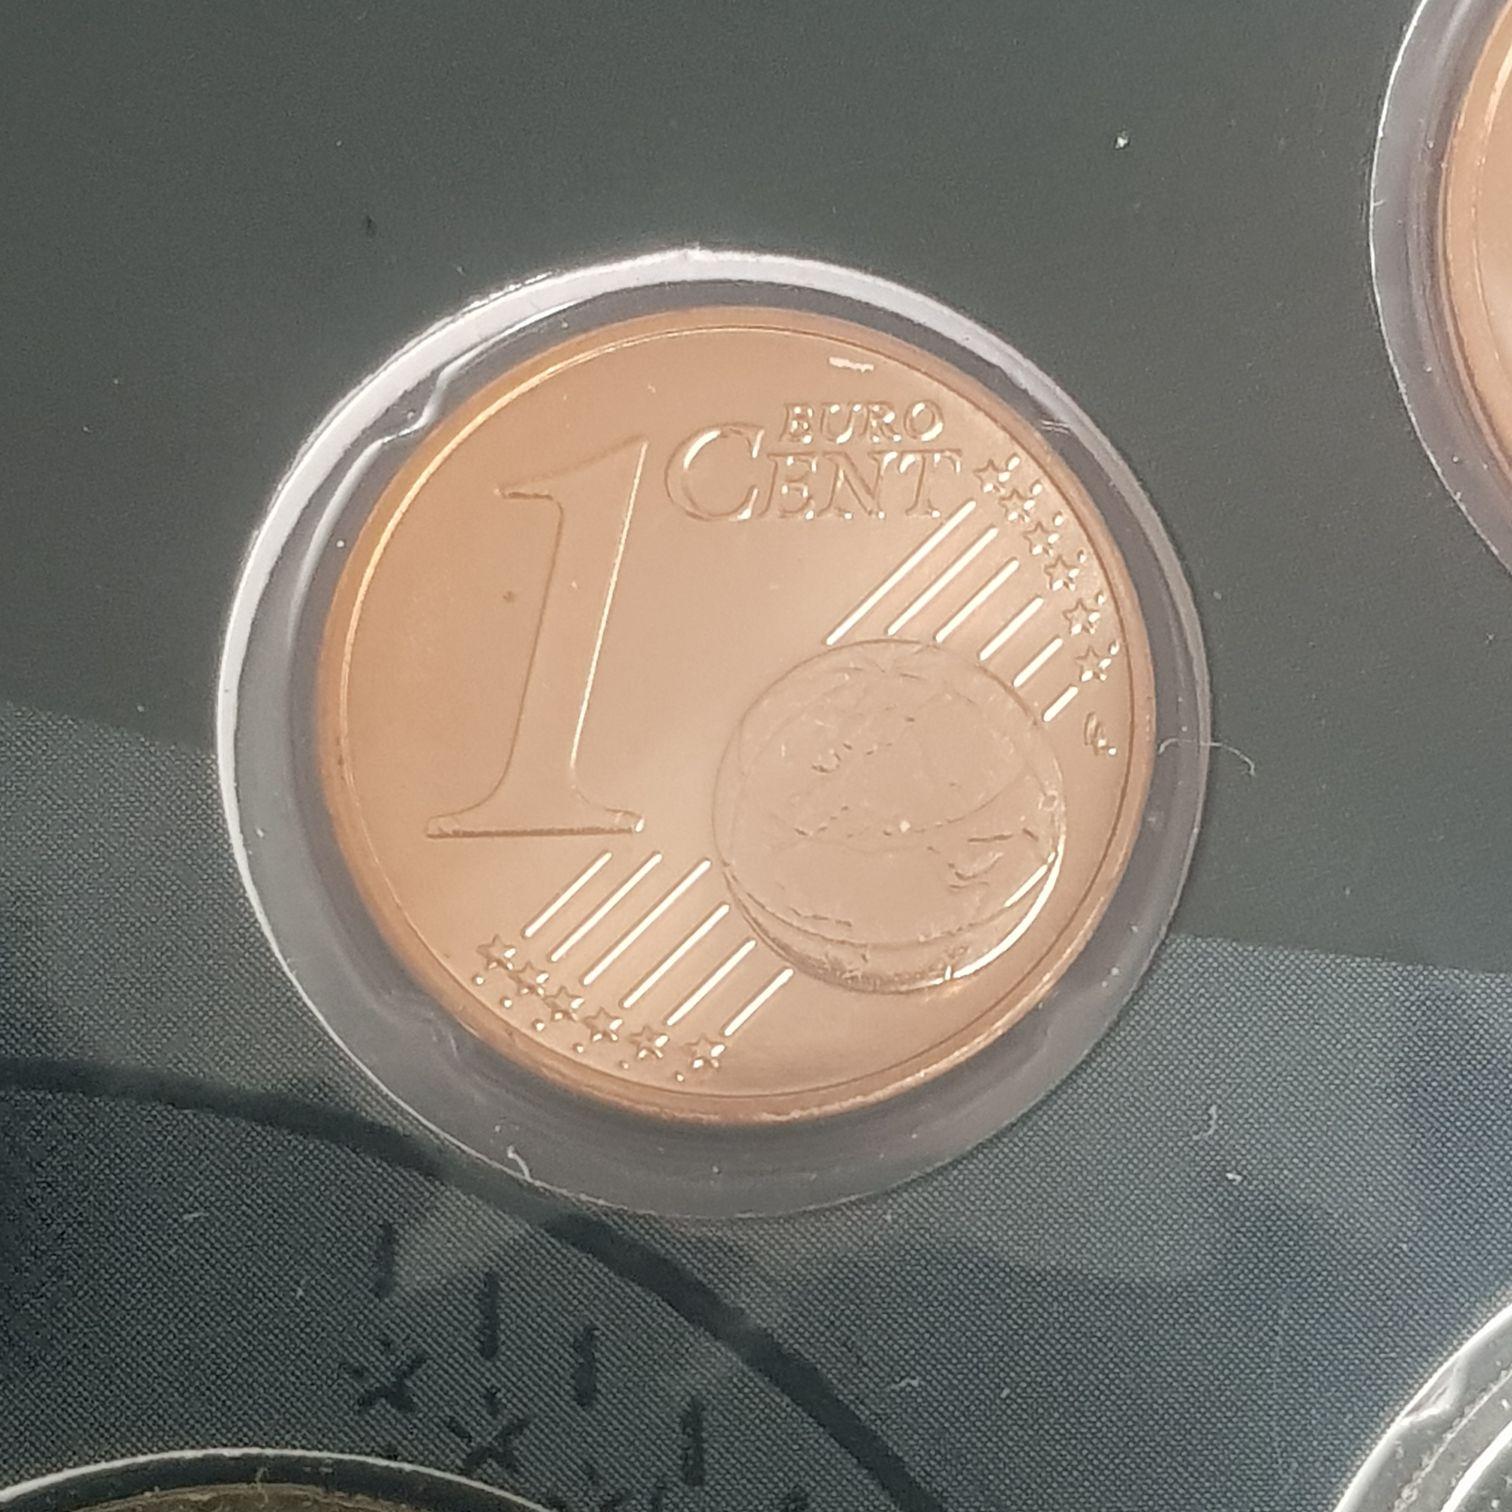 .01 Centavo De Euro Coin - $.01 (2017) front image (front cover)